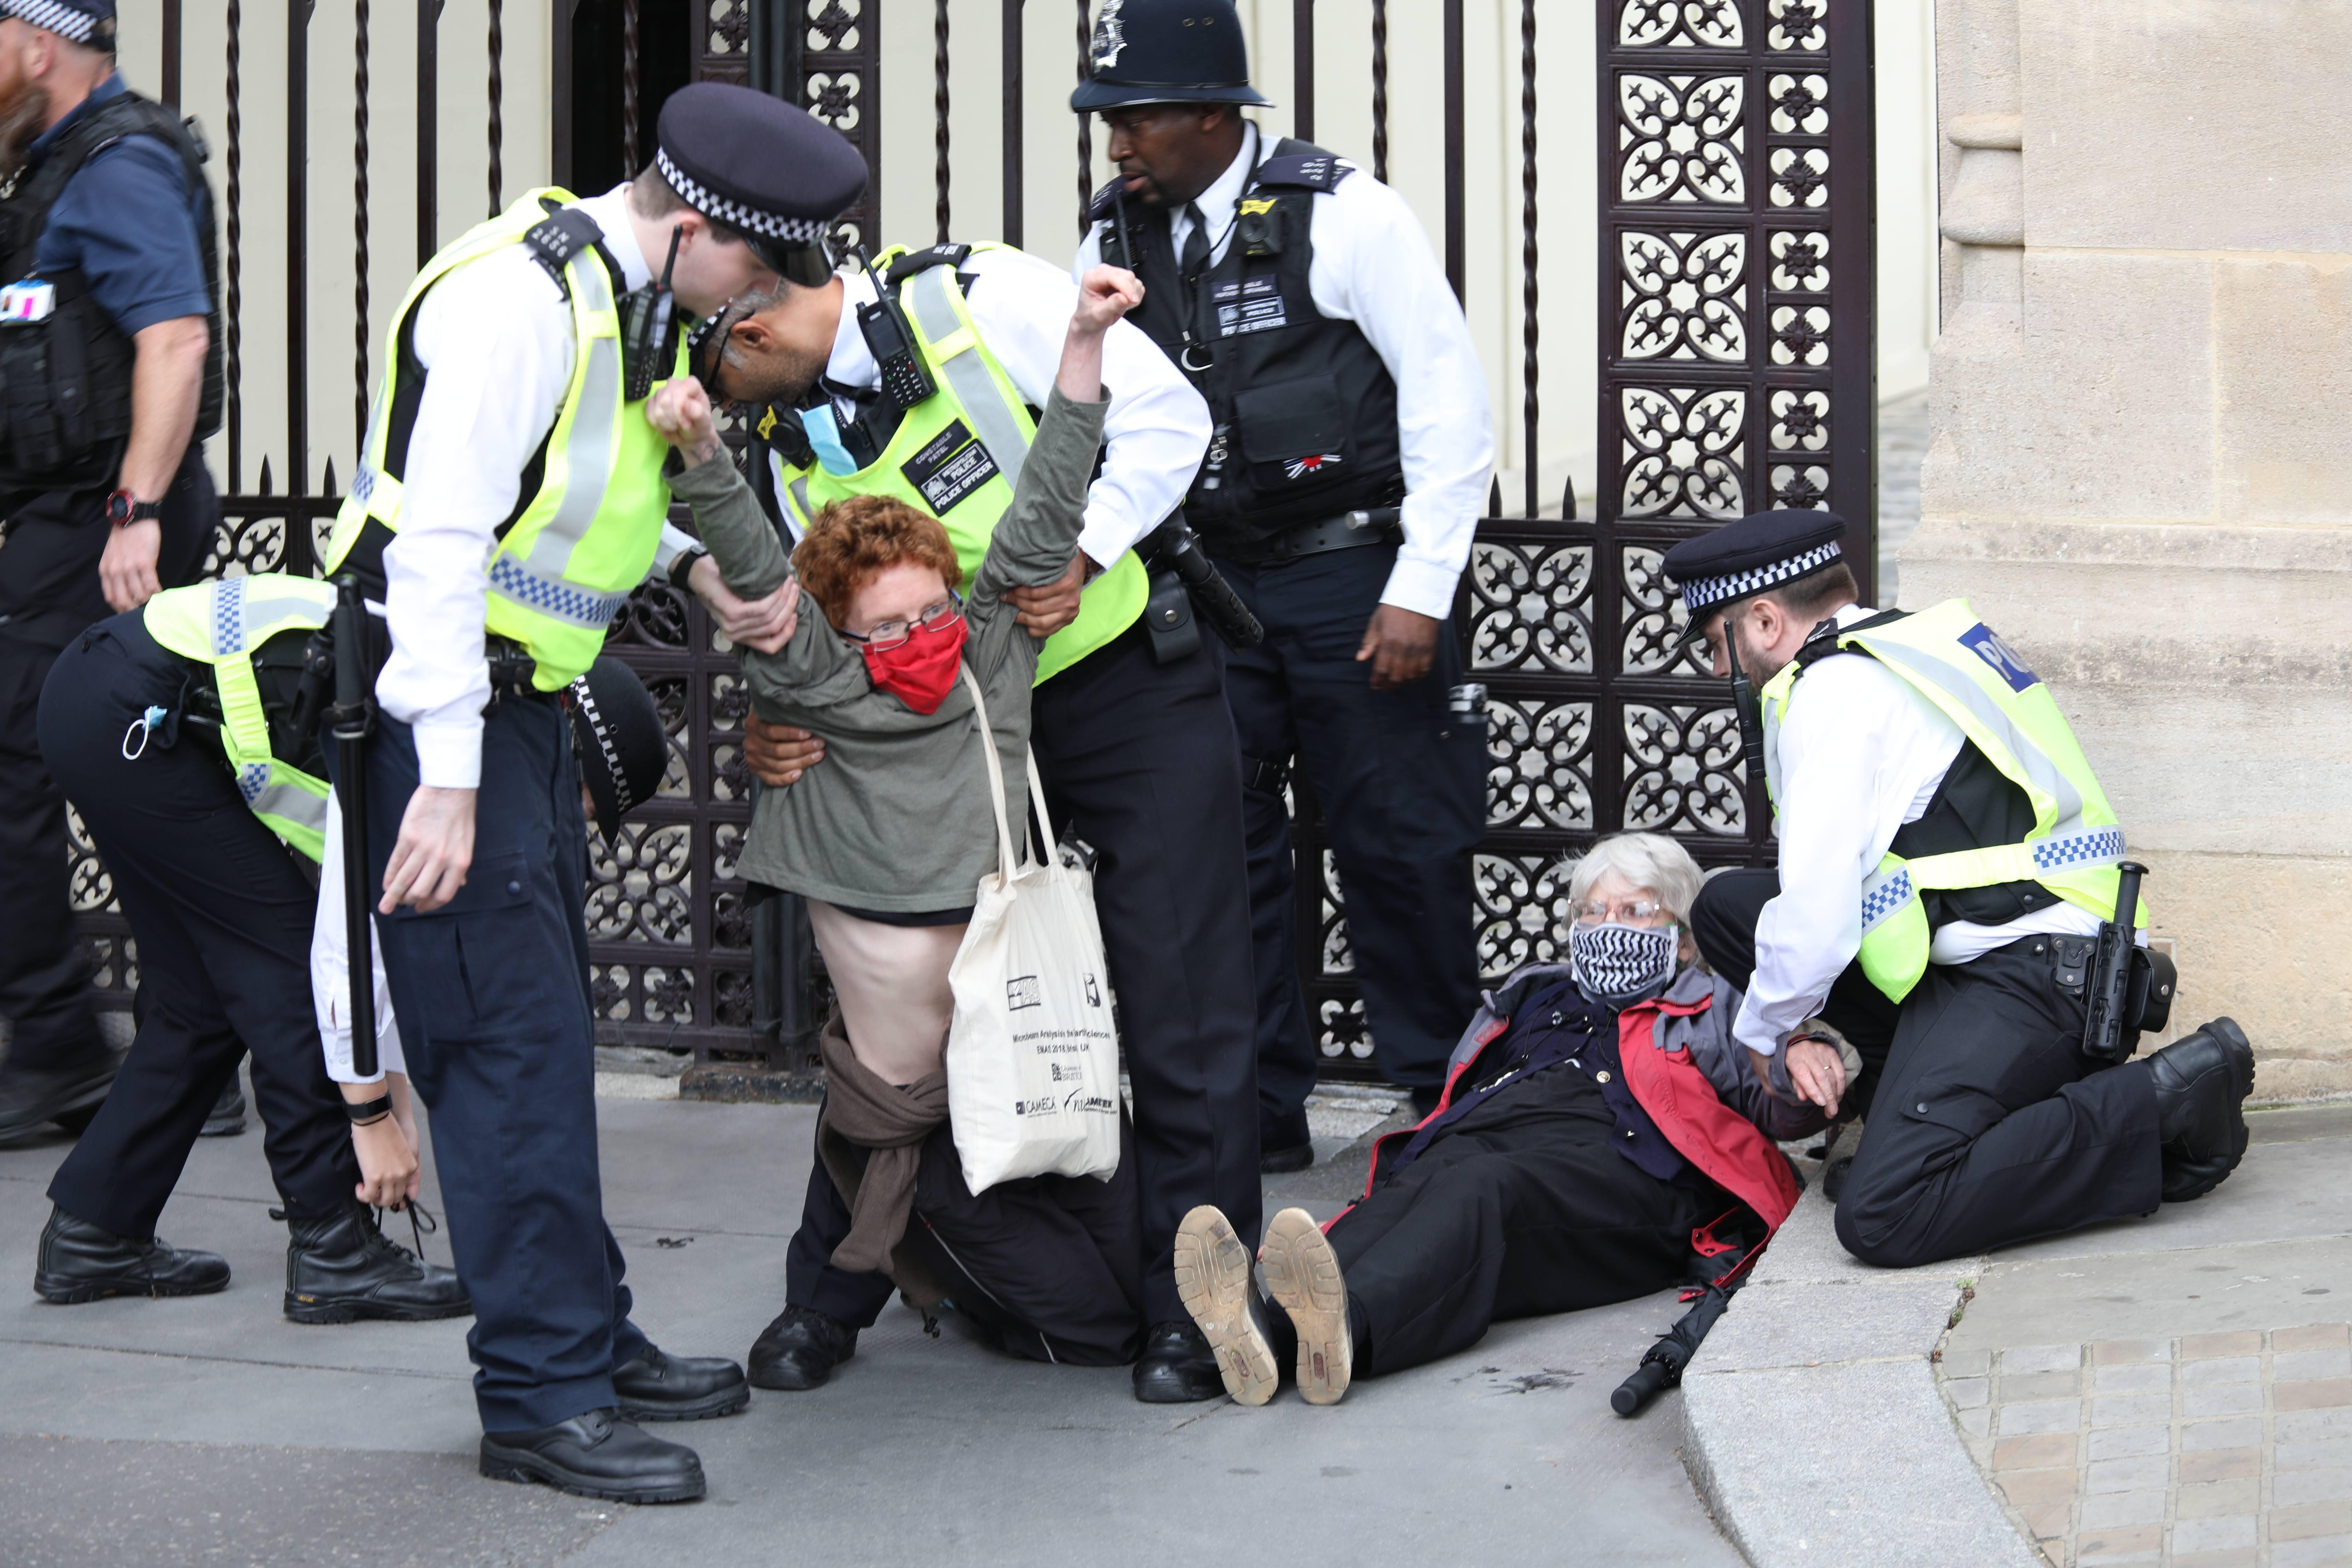 Man arrested for vandalising Winston Churchill statue during Extinction Rebellion protest